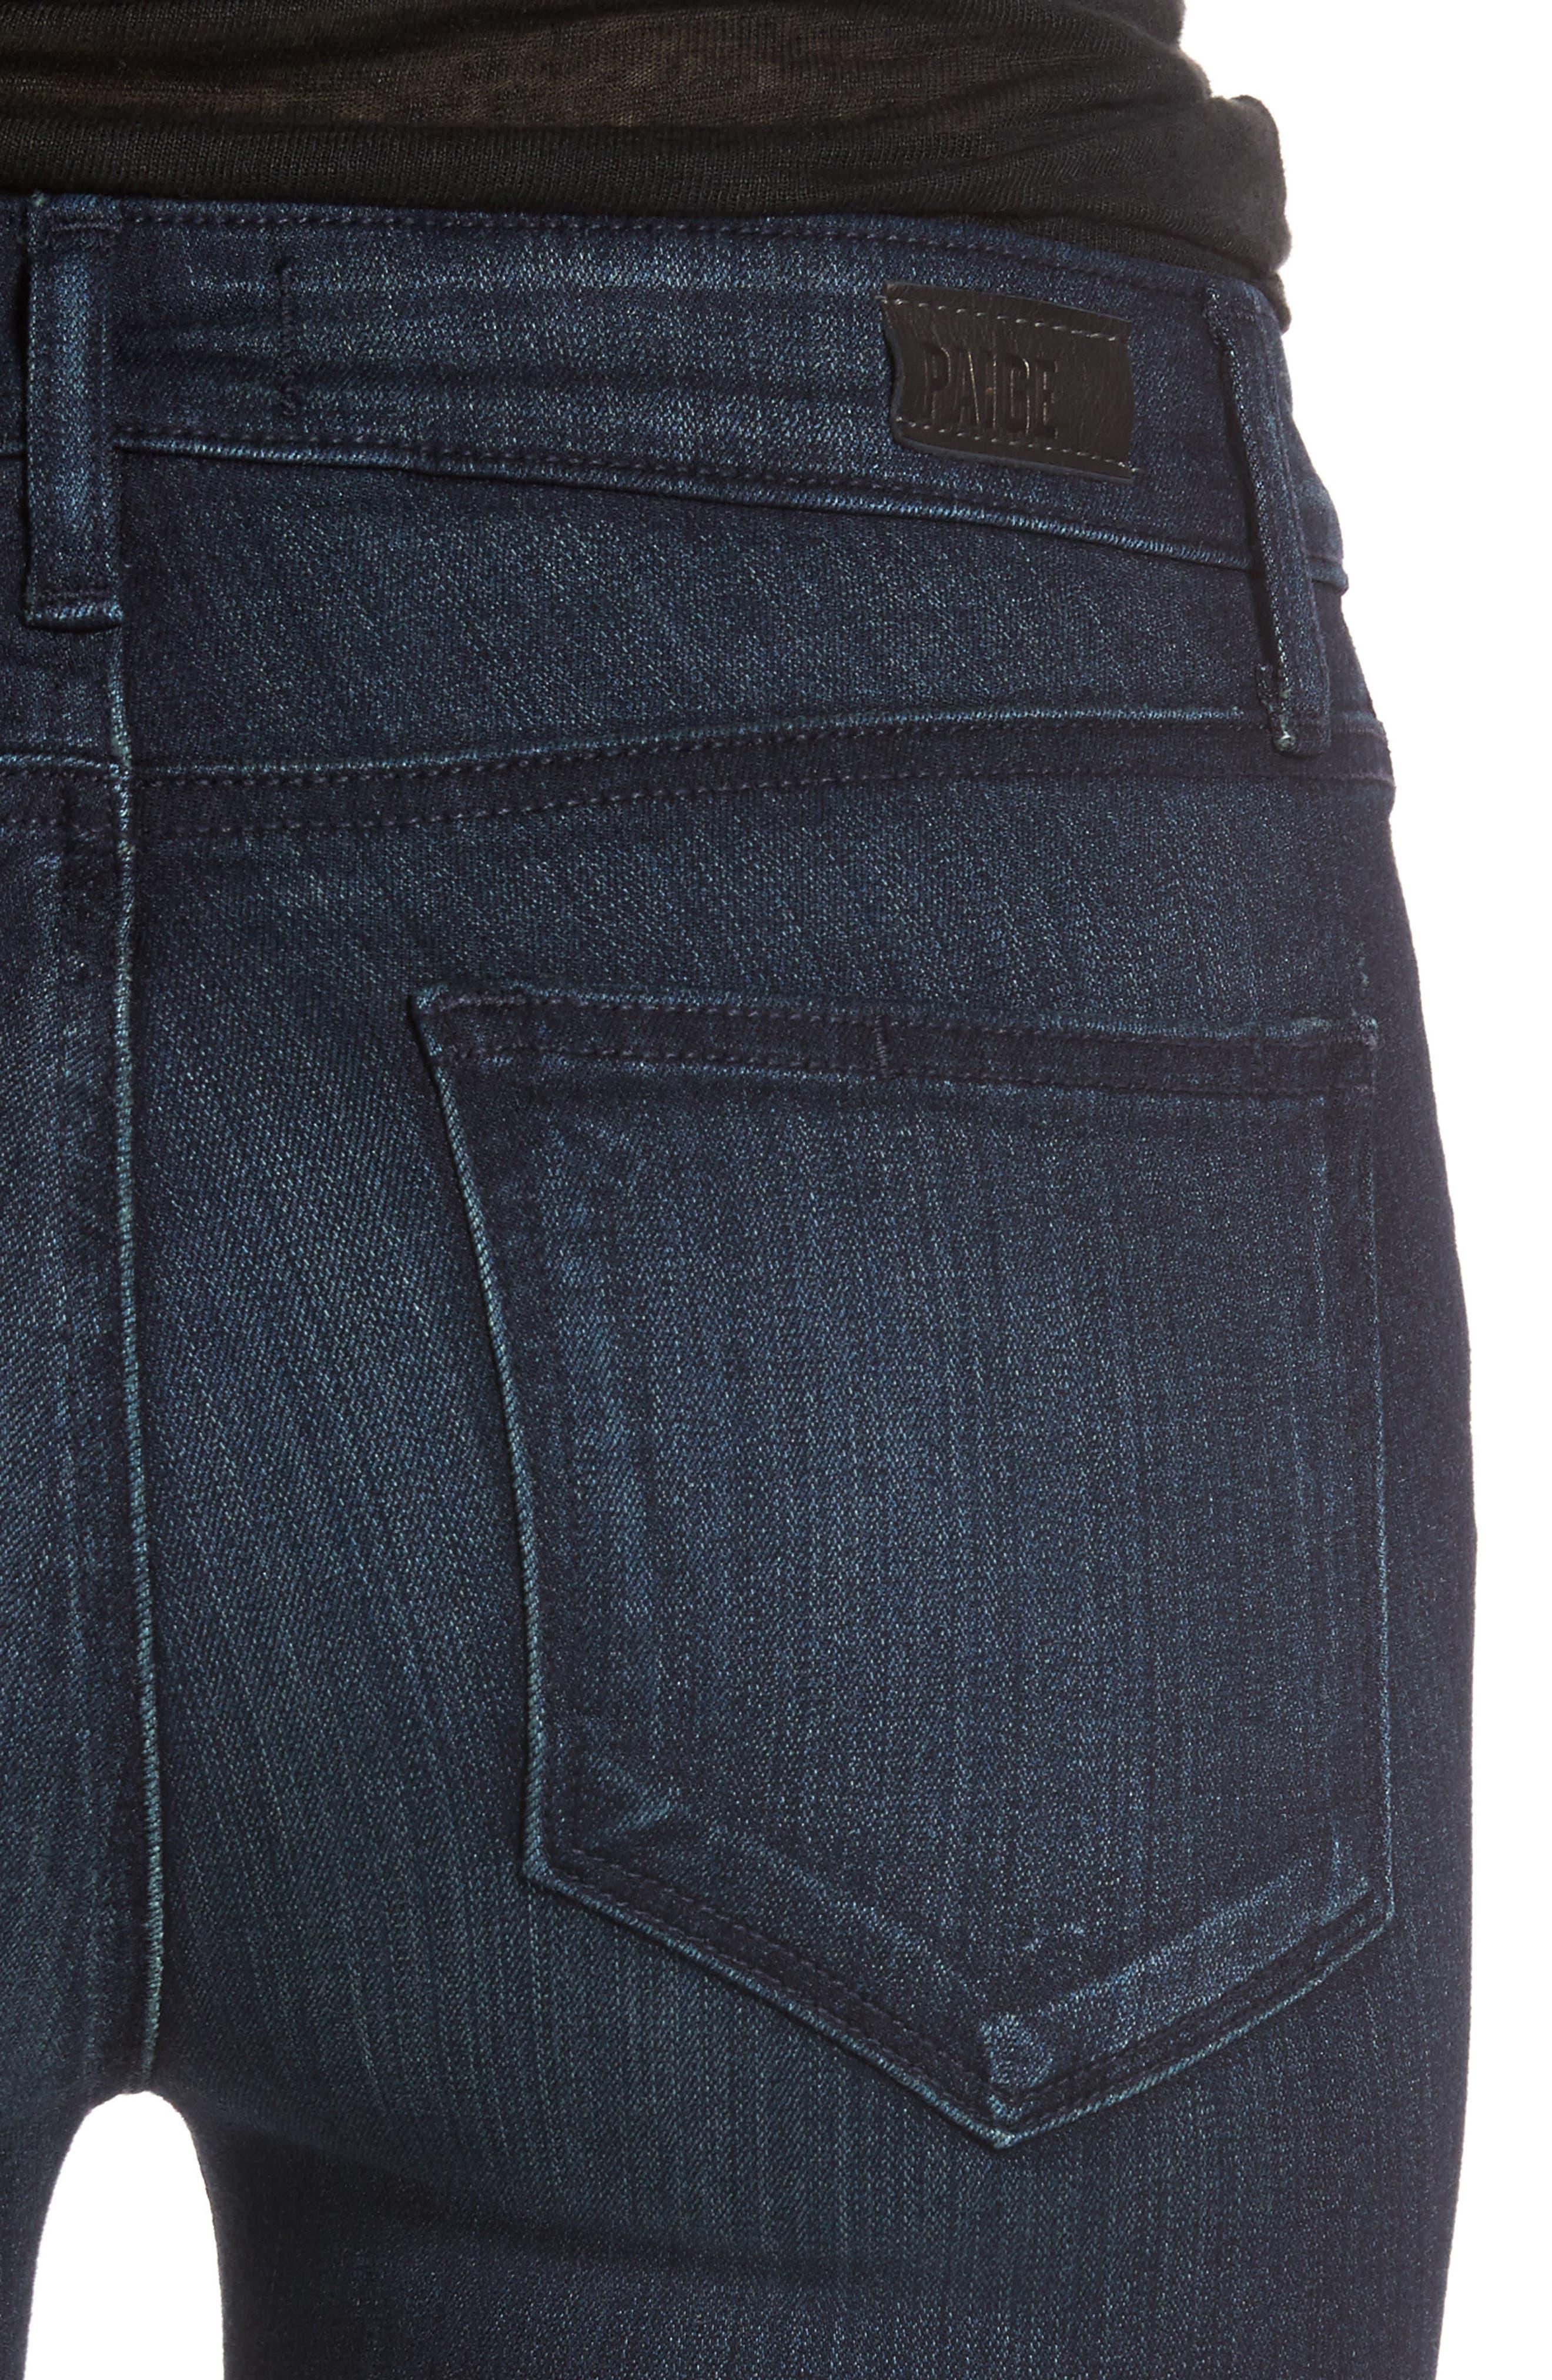 Transcend - Verdugo Ankle Skinny Jeans,                             Alternate thumbnail 4, color,                             Midlake